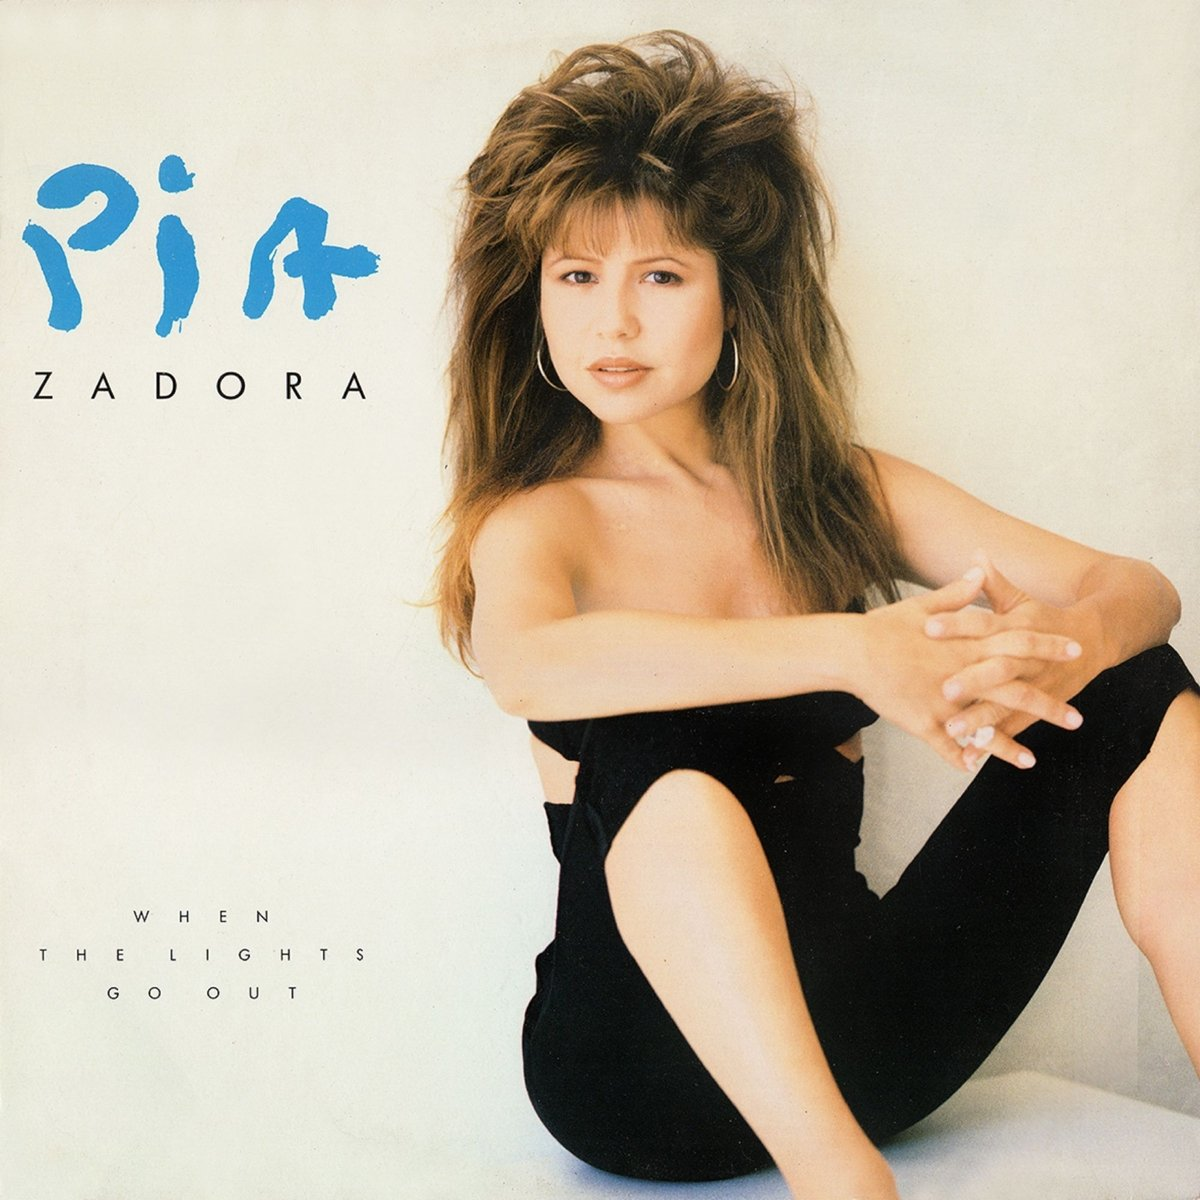 CD : Pia Zadora - When The Lights Go Out (Bonus Tracks, Deluxe Edition, 2PC)